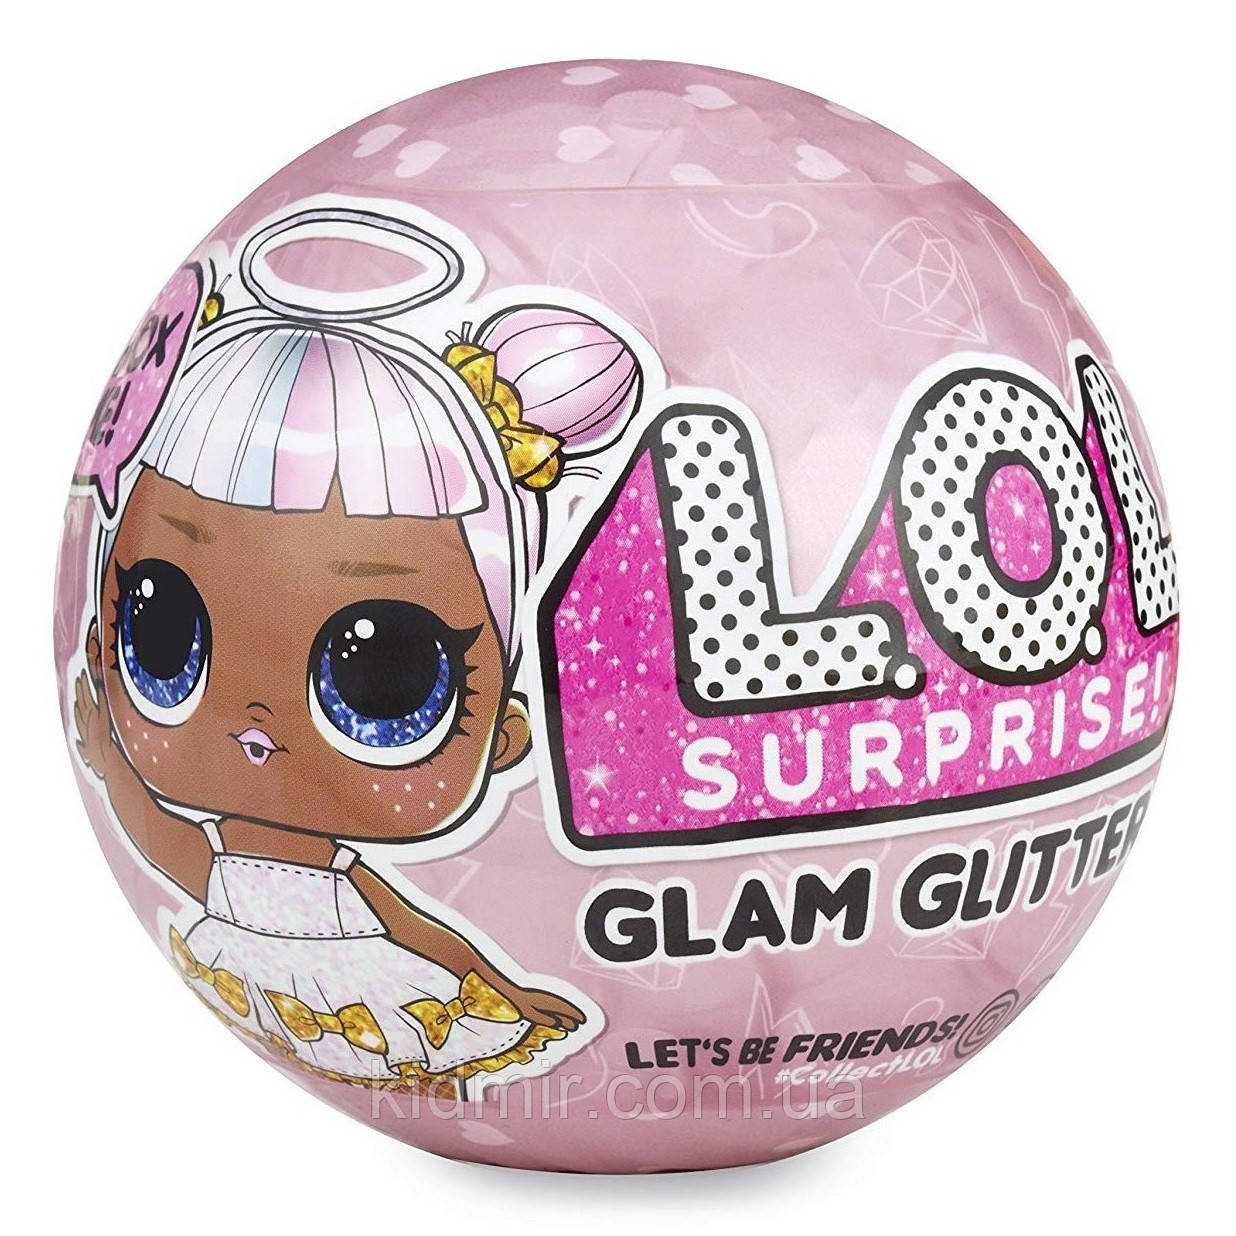 Кукла-сюрприз Лол Глэм Глиттер 4 серия L.O.L. lol Surprise! Glam Glitter S 4